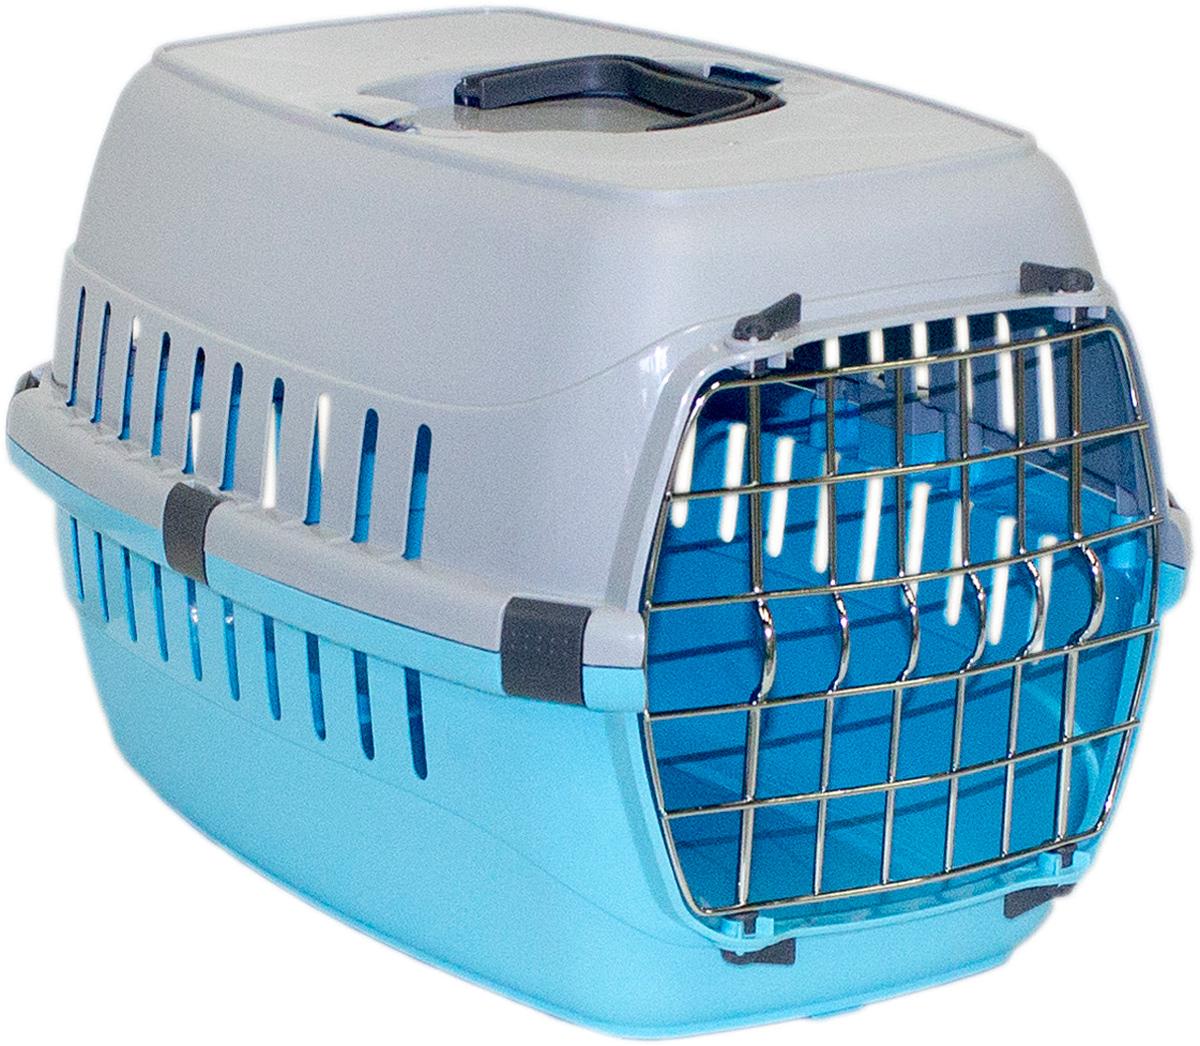 Переноска для животных Moderna Roadrunner 1, с металлической дверью, цвет: голубой, 31 х 51 х 34 см roadrunner 506 gps отзывы